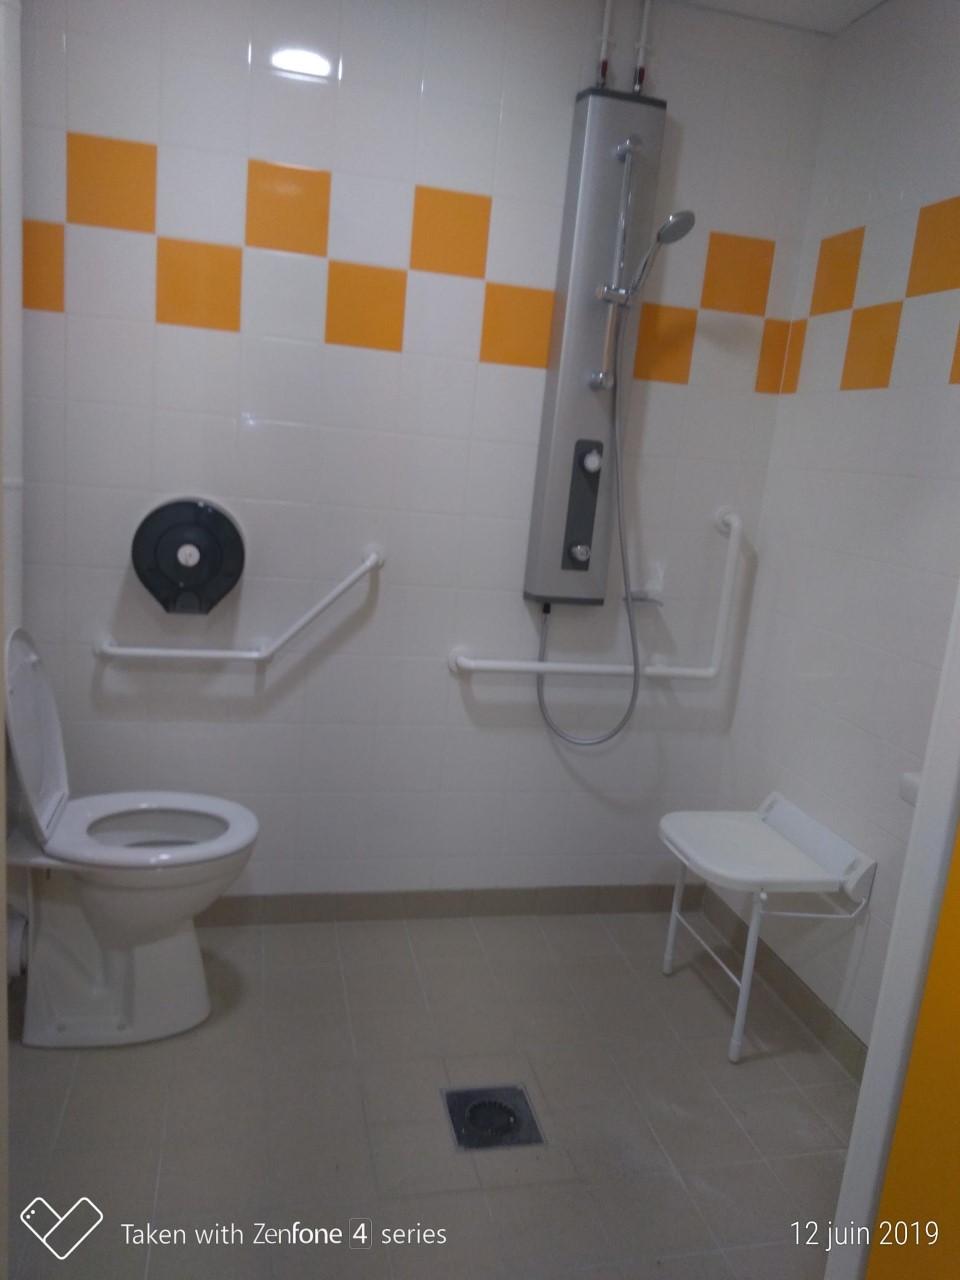 equpement sanitaire pmr